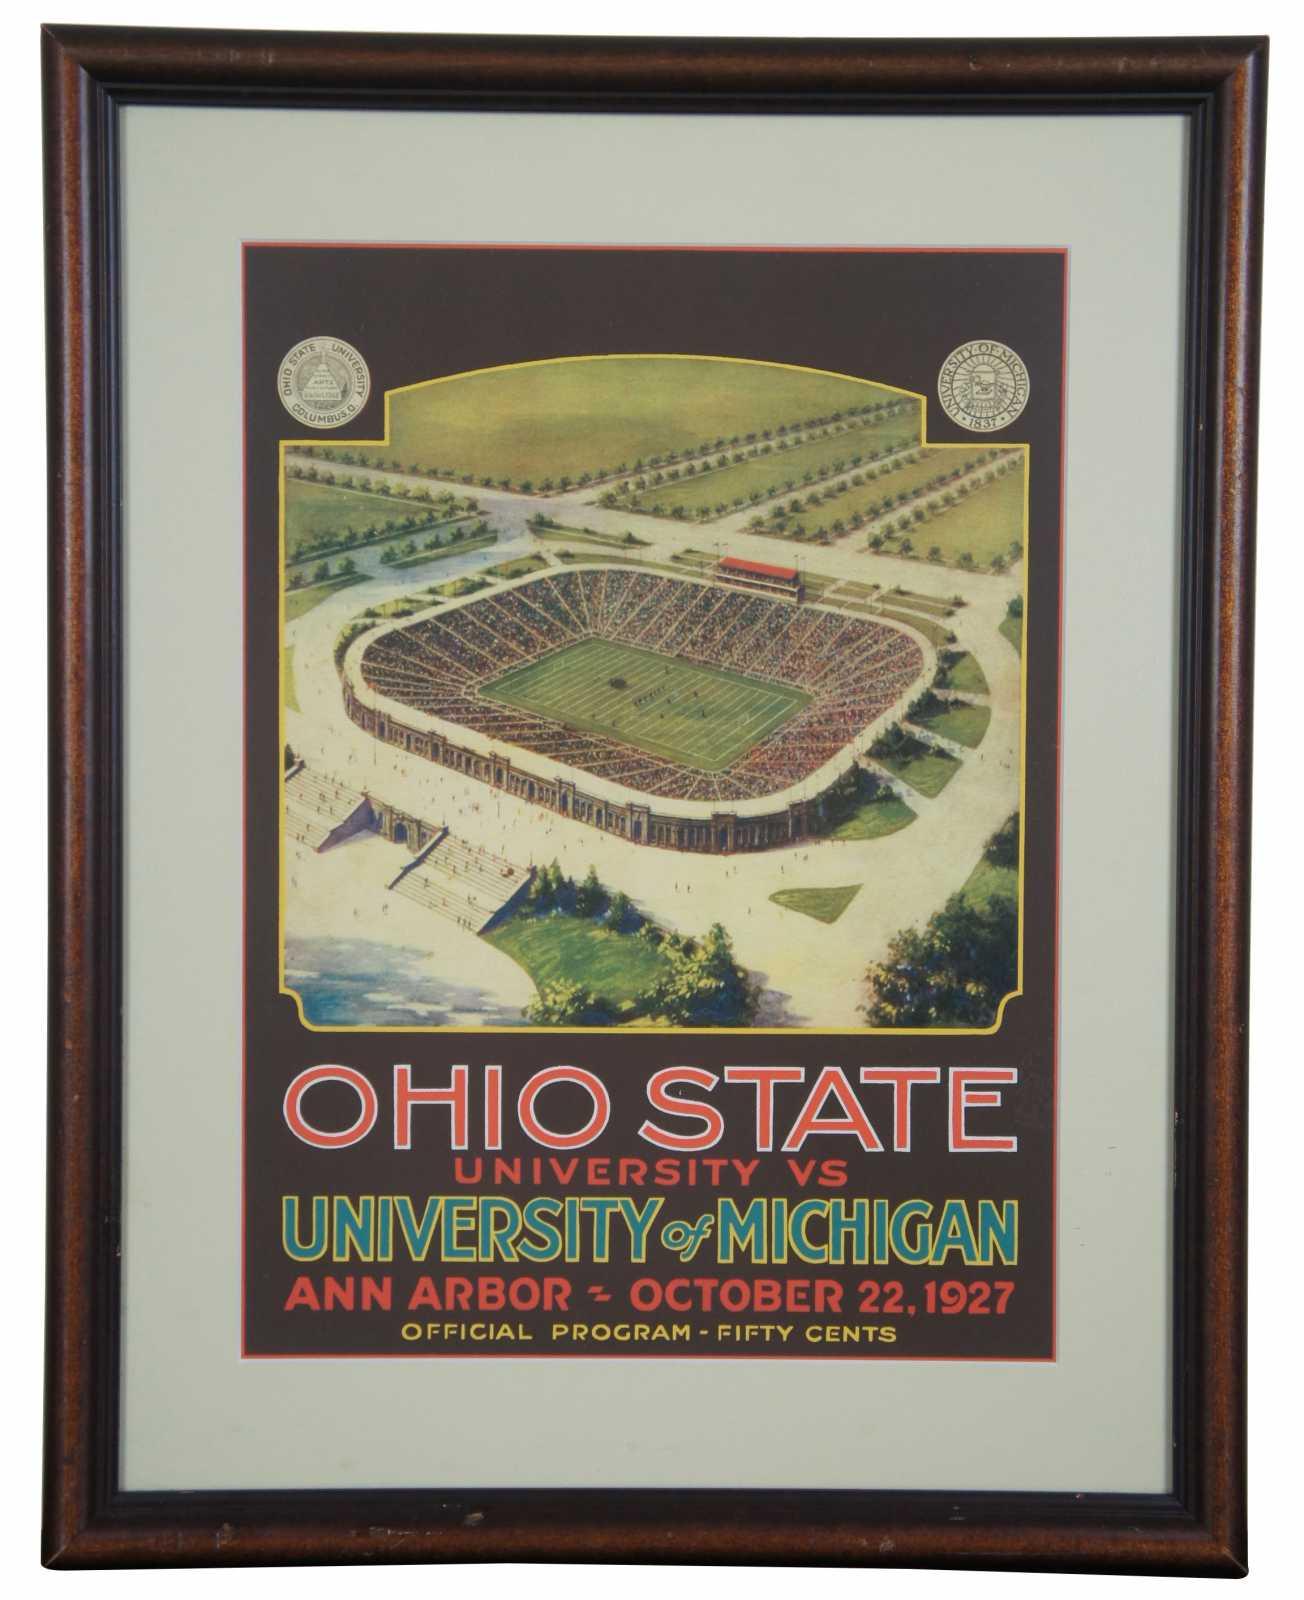 1927 ohio state vs michigan football program advertisement poster print osu 21